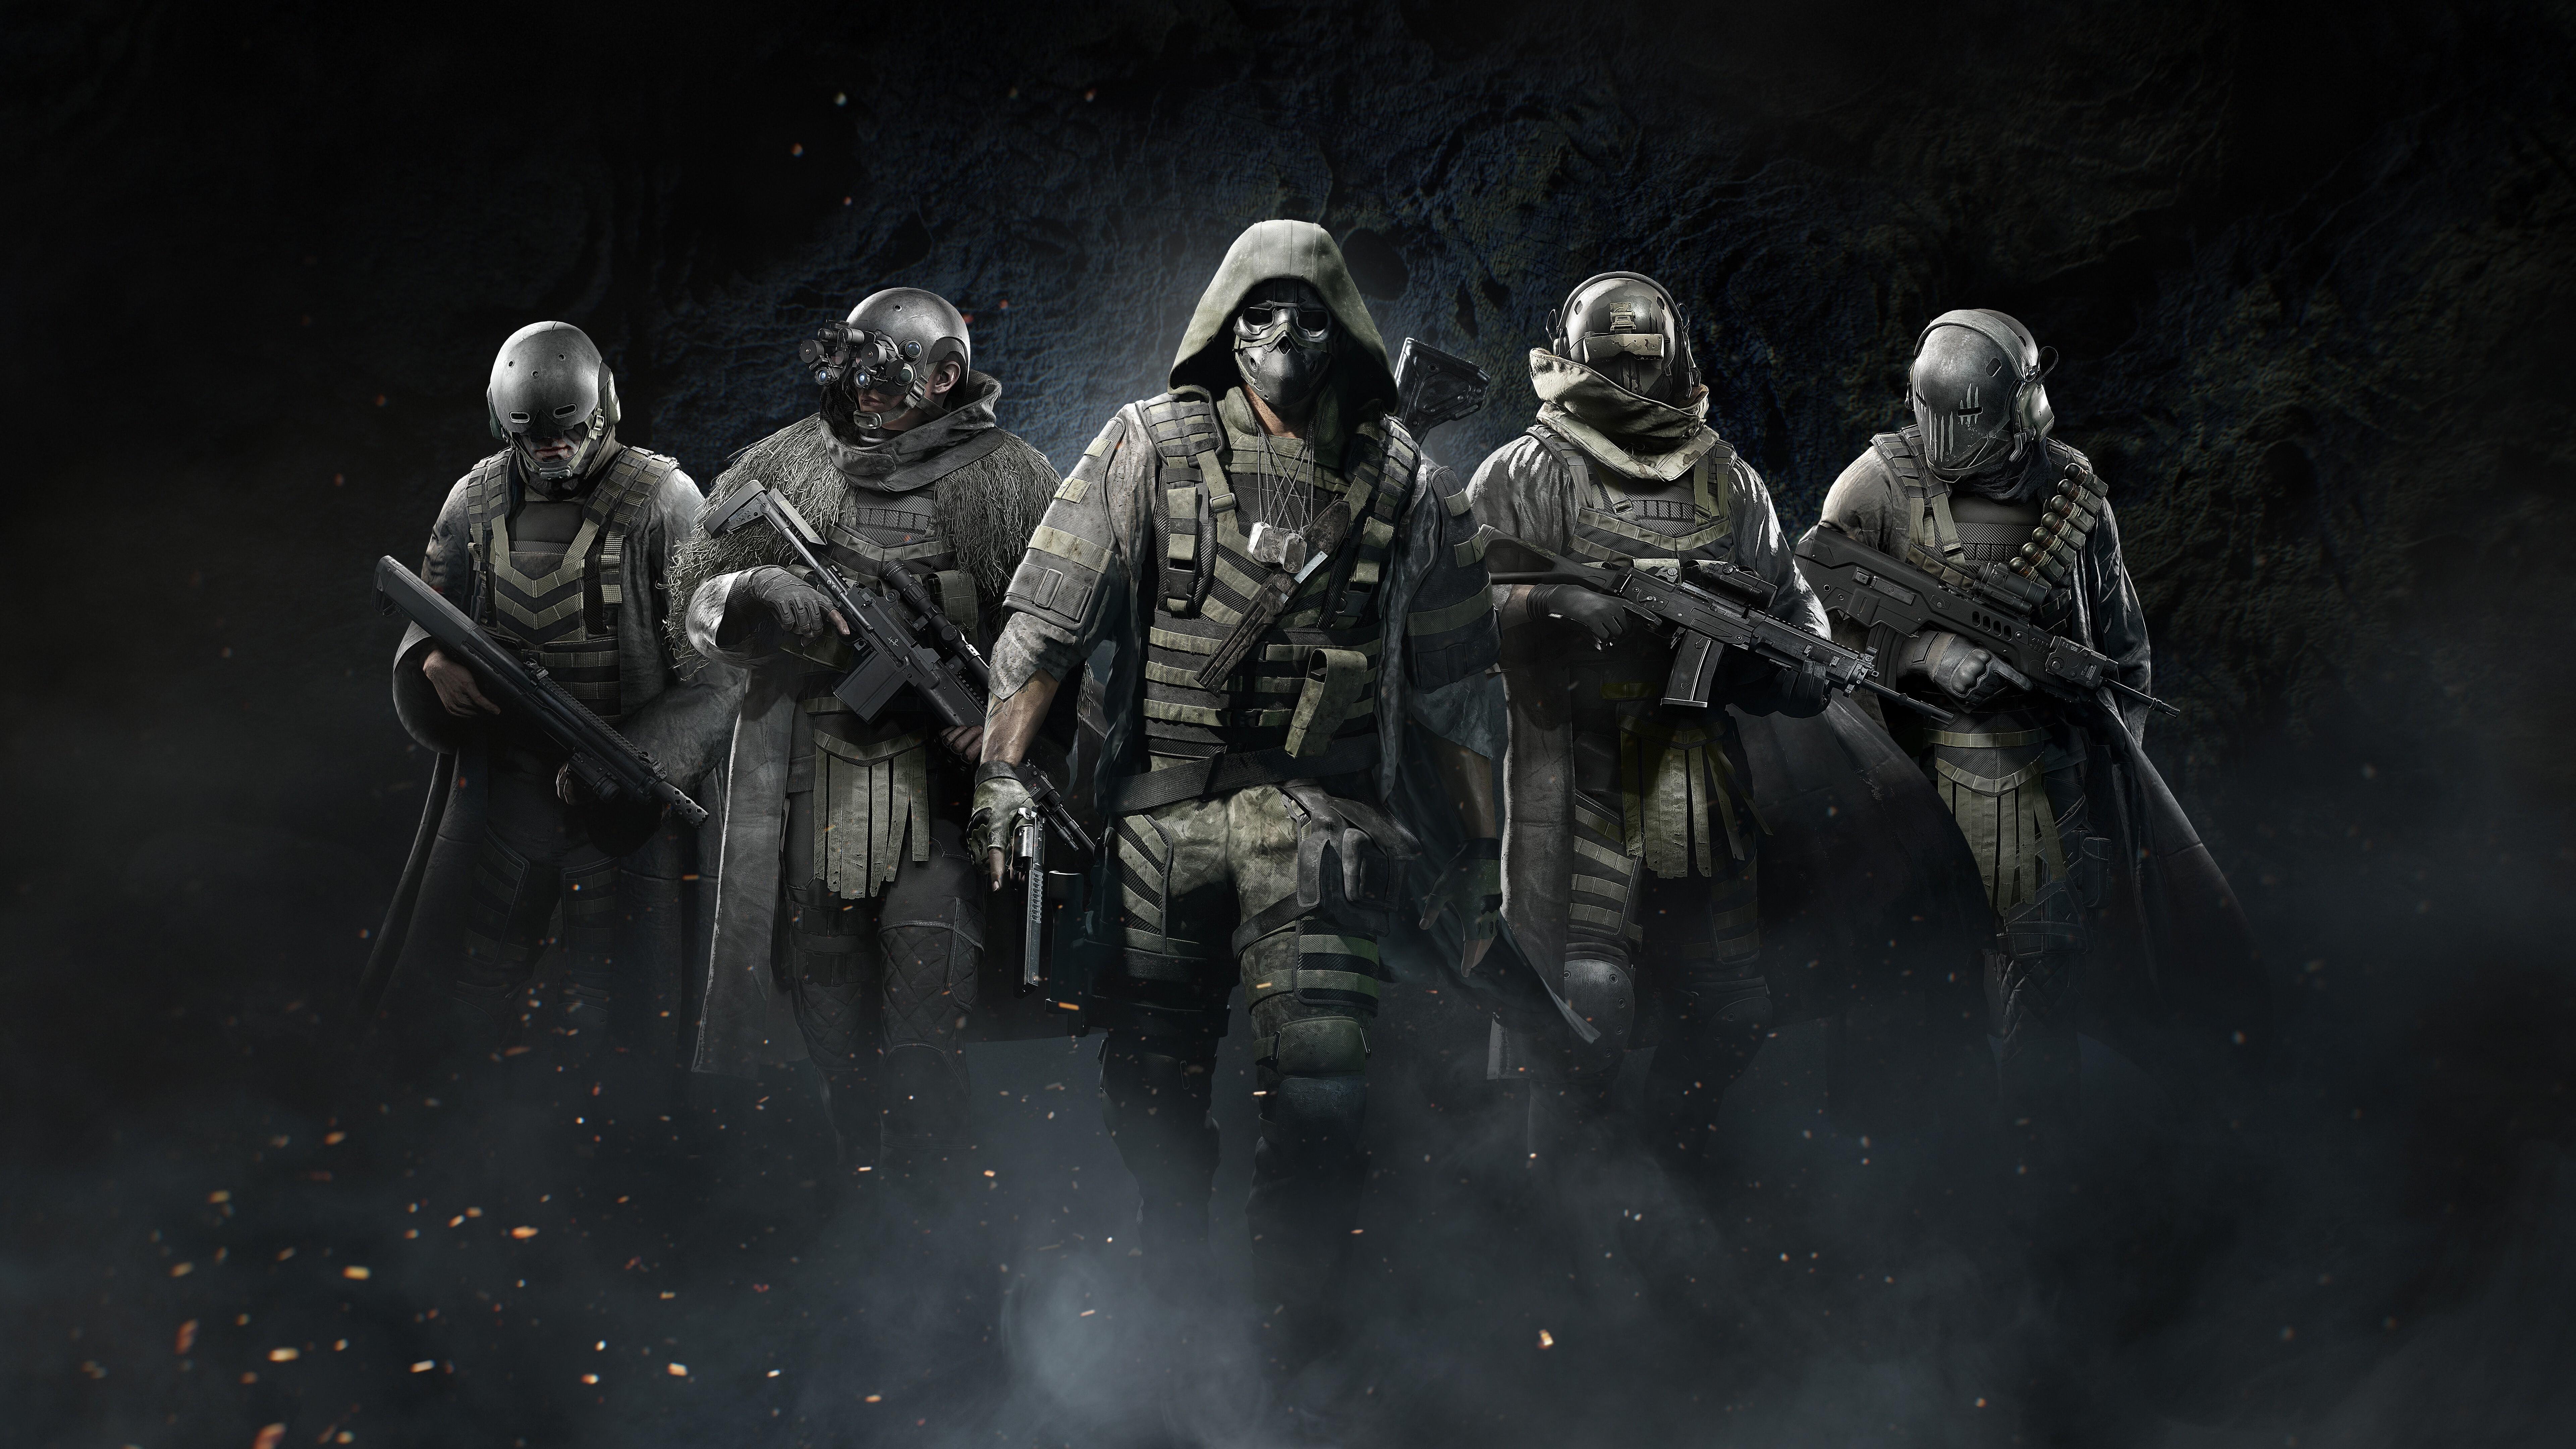 Tom Clancys Ghost Recon Breakpoint 8k Game Desktop Wallpaper Hd Wallpapers